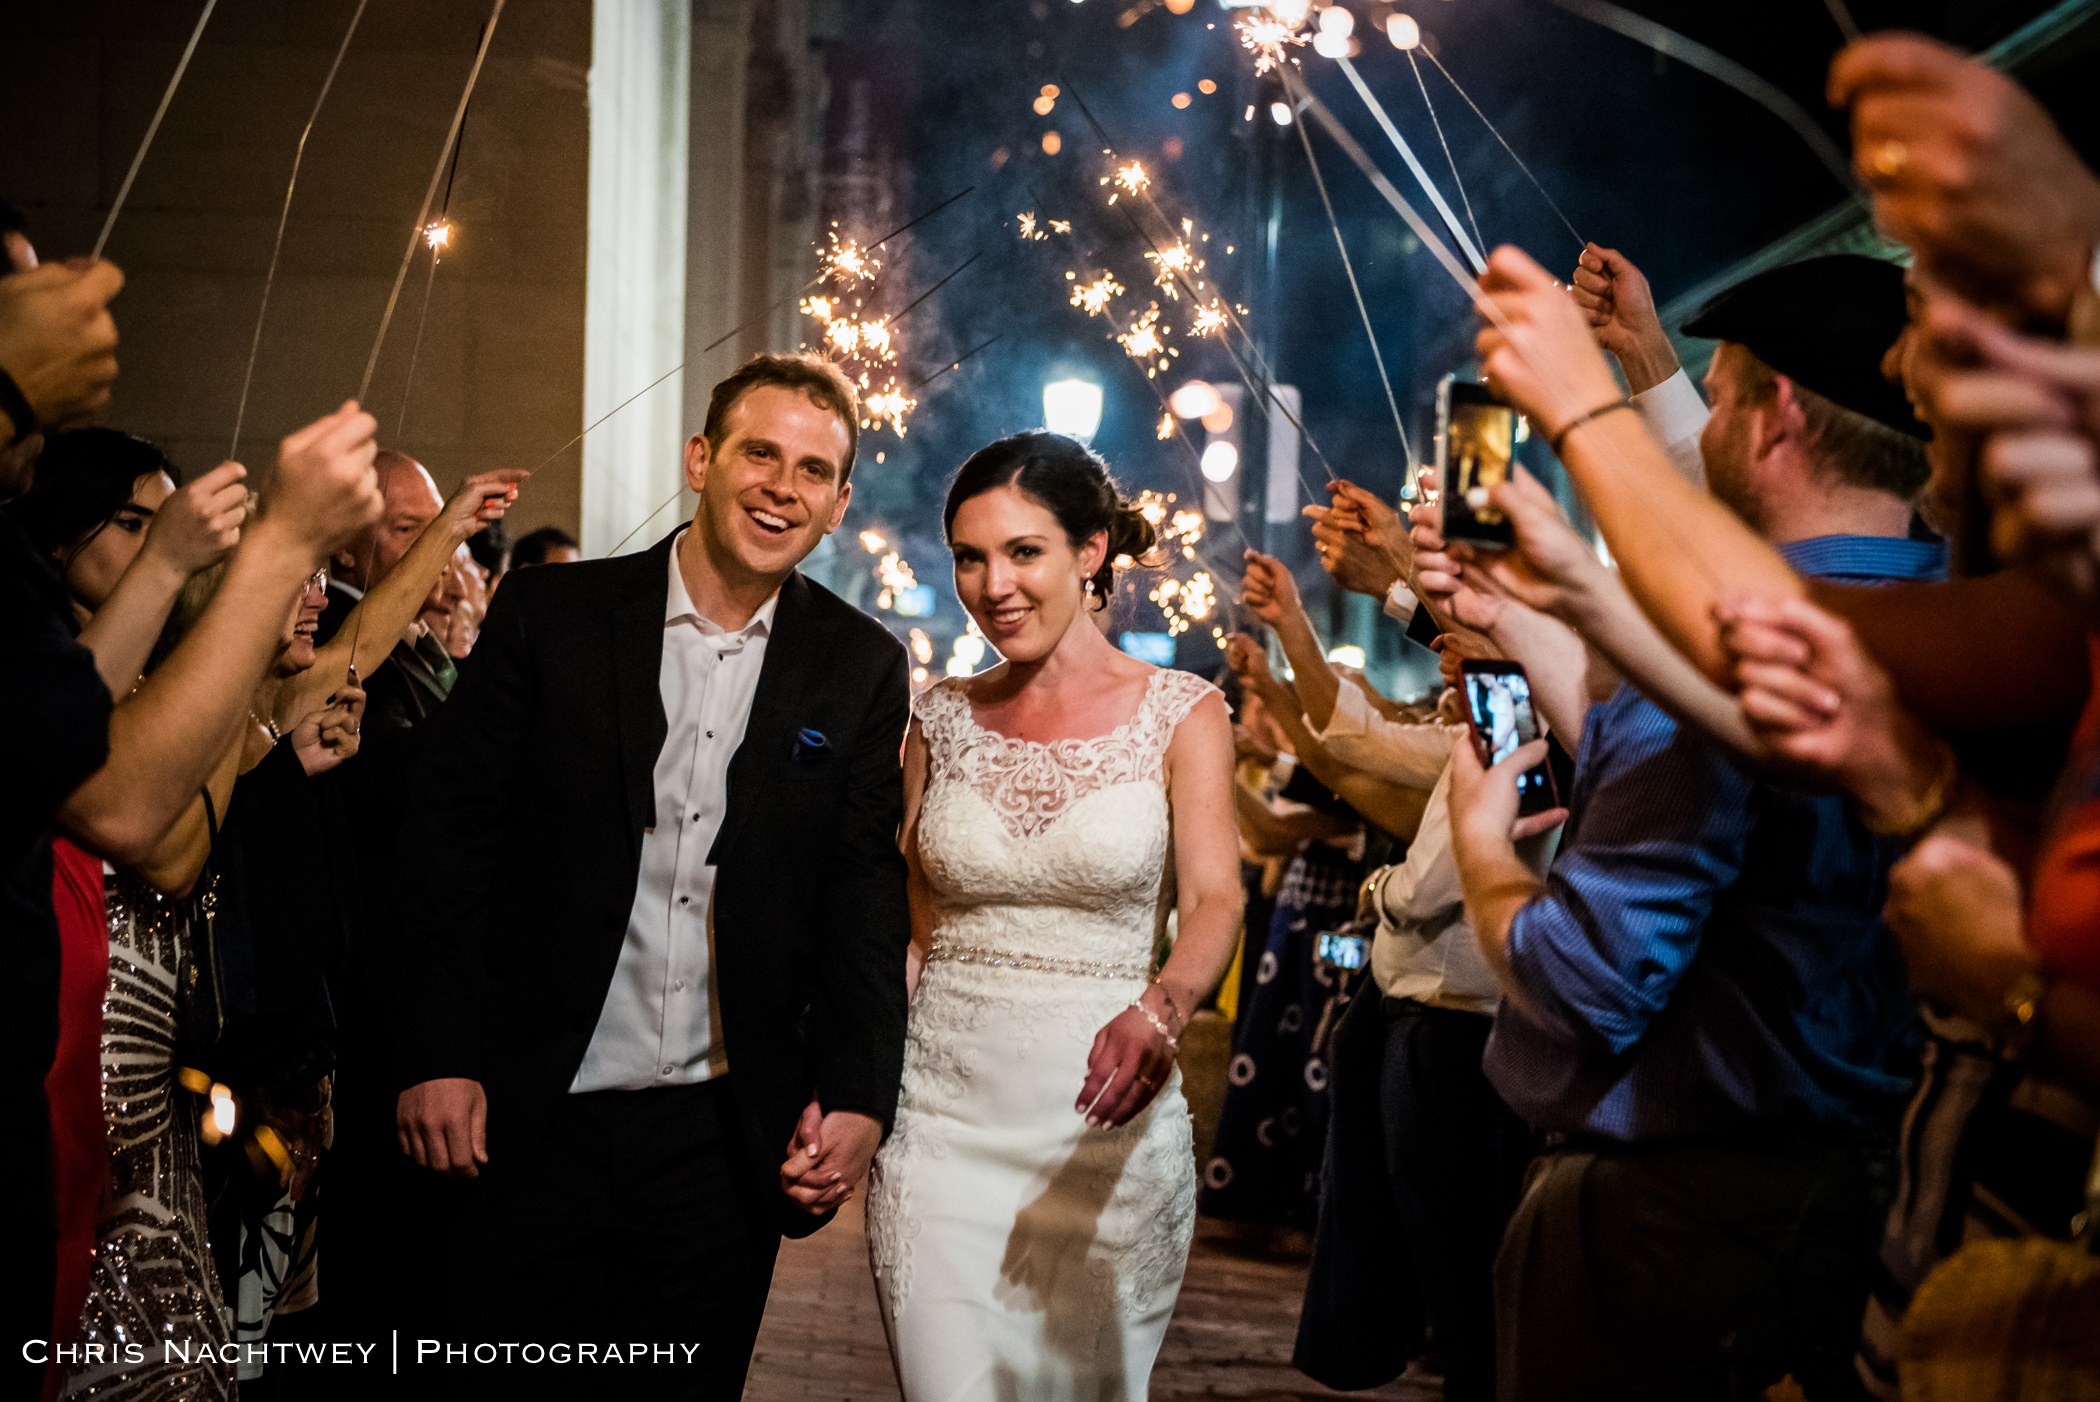 artistic-ct-wedding-photographers-chris-nachtwey-2017-86.jpg